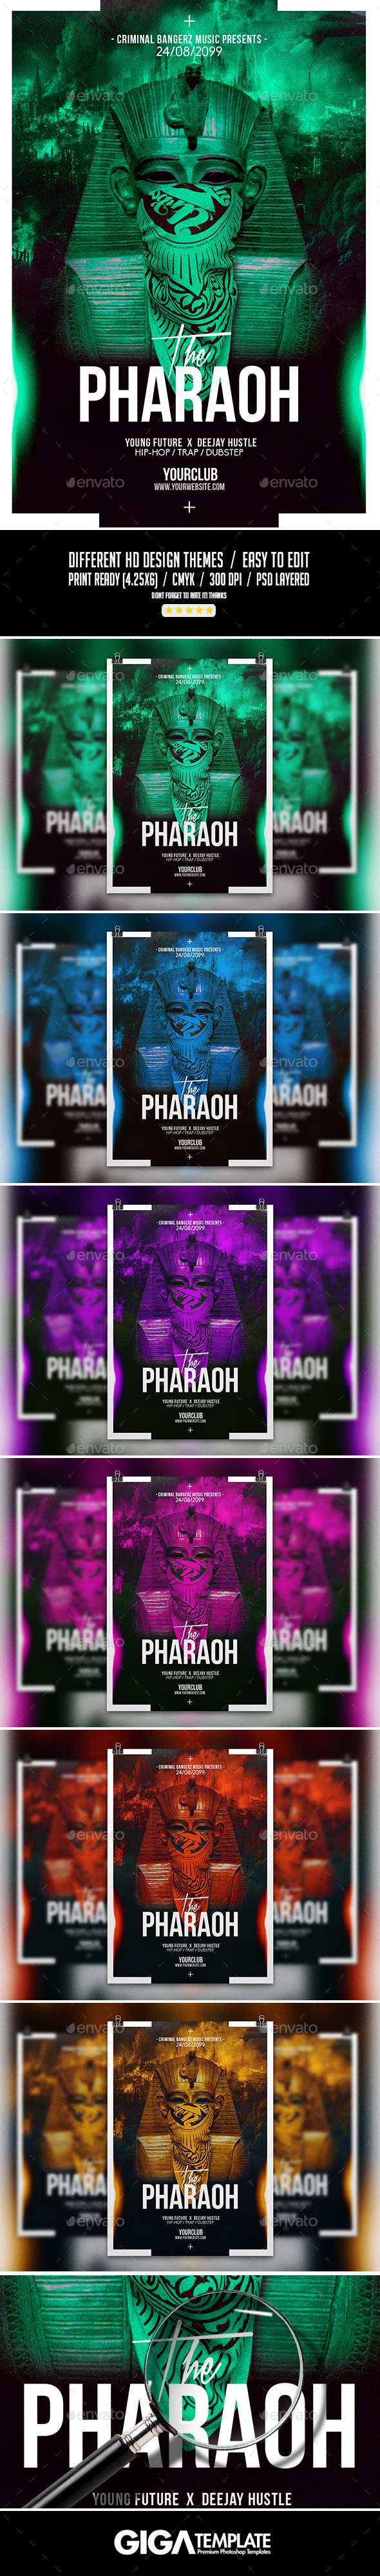 The Pharaoh | Hip-Hop Modern Flyer PSD Template - Events Flyers